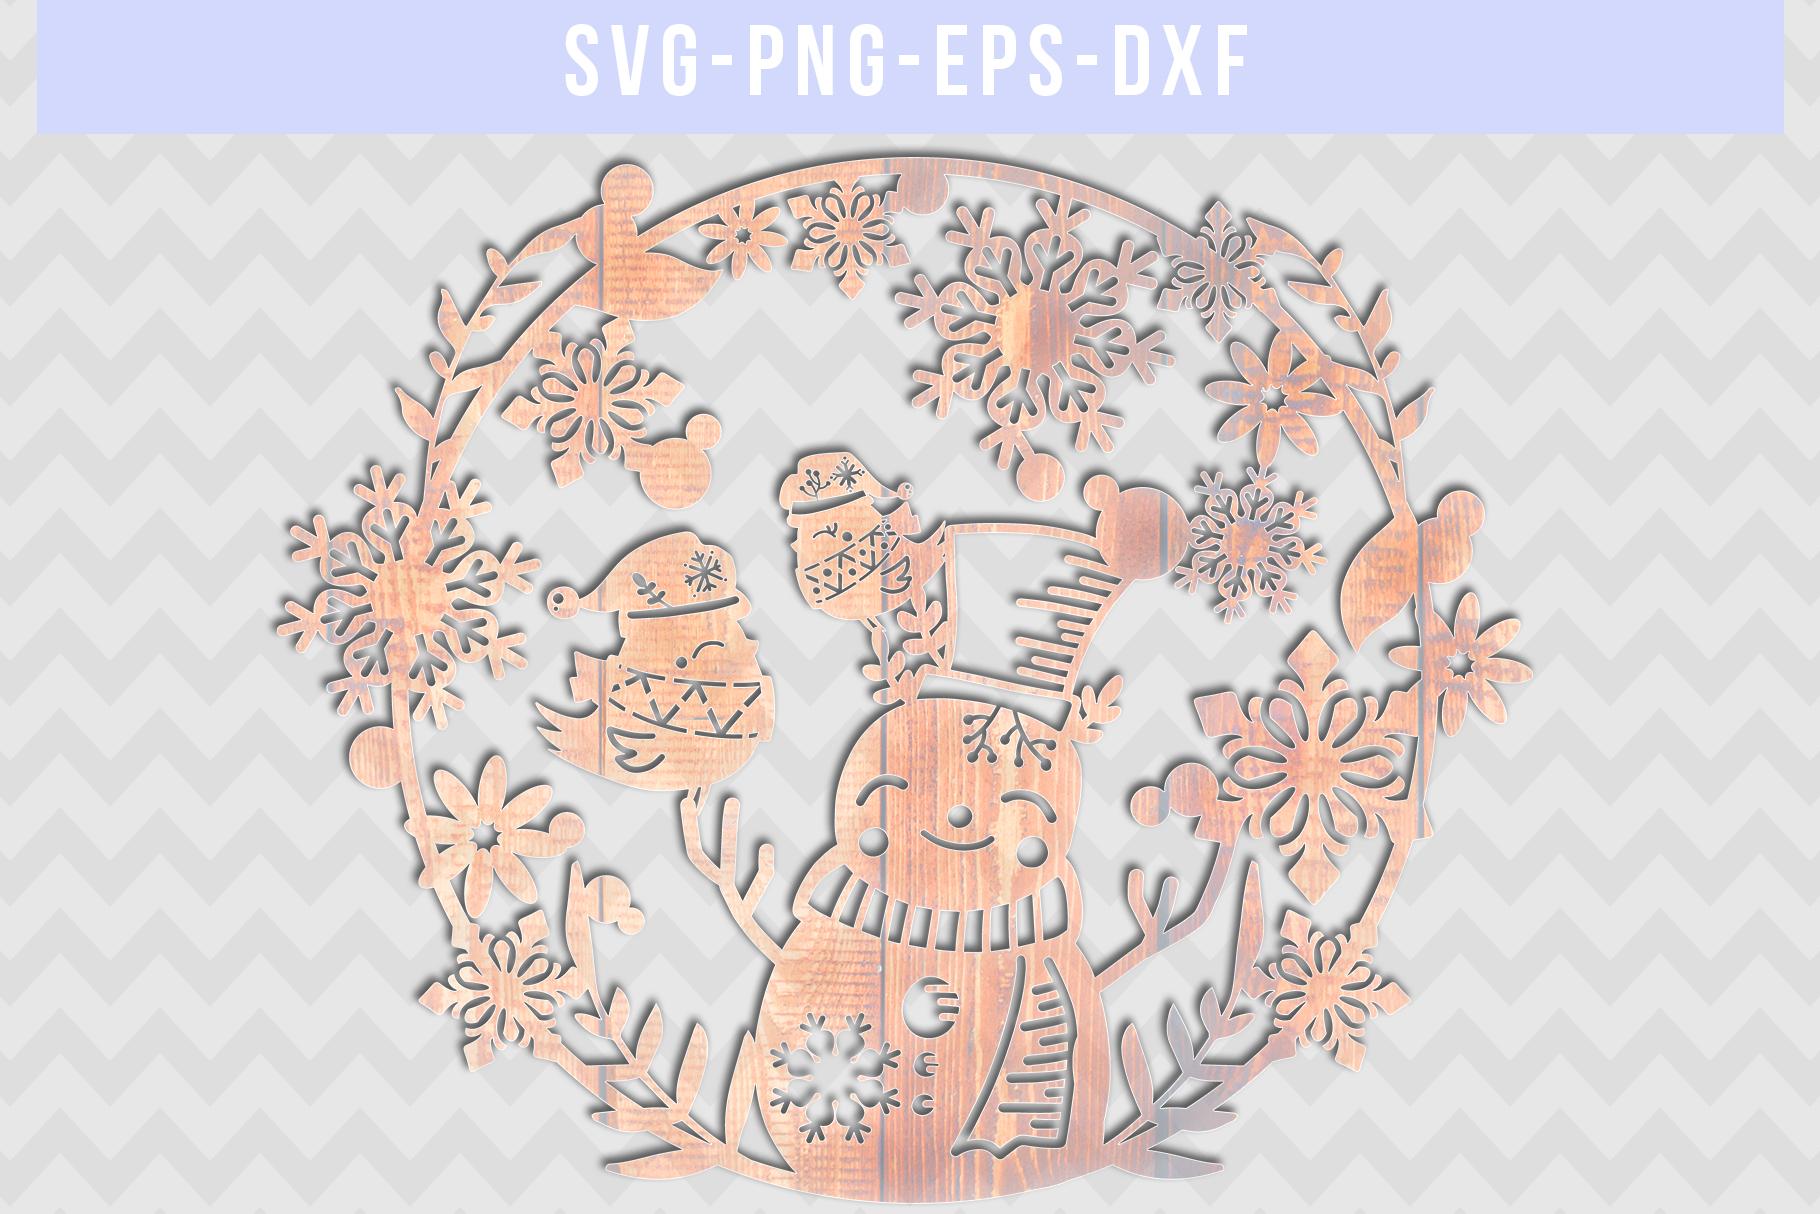 Winter SVG Cut File, Snowflake Papercut, Snowman Laser Cut example image 4